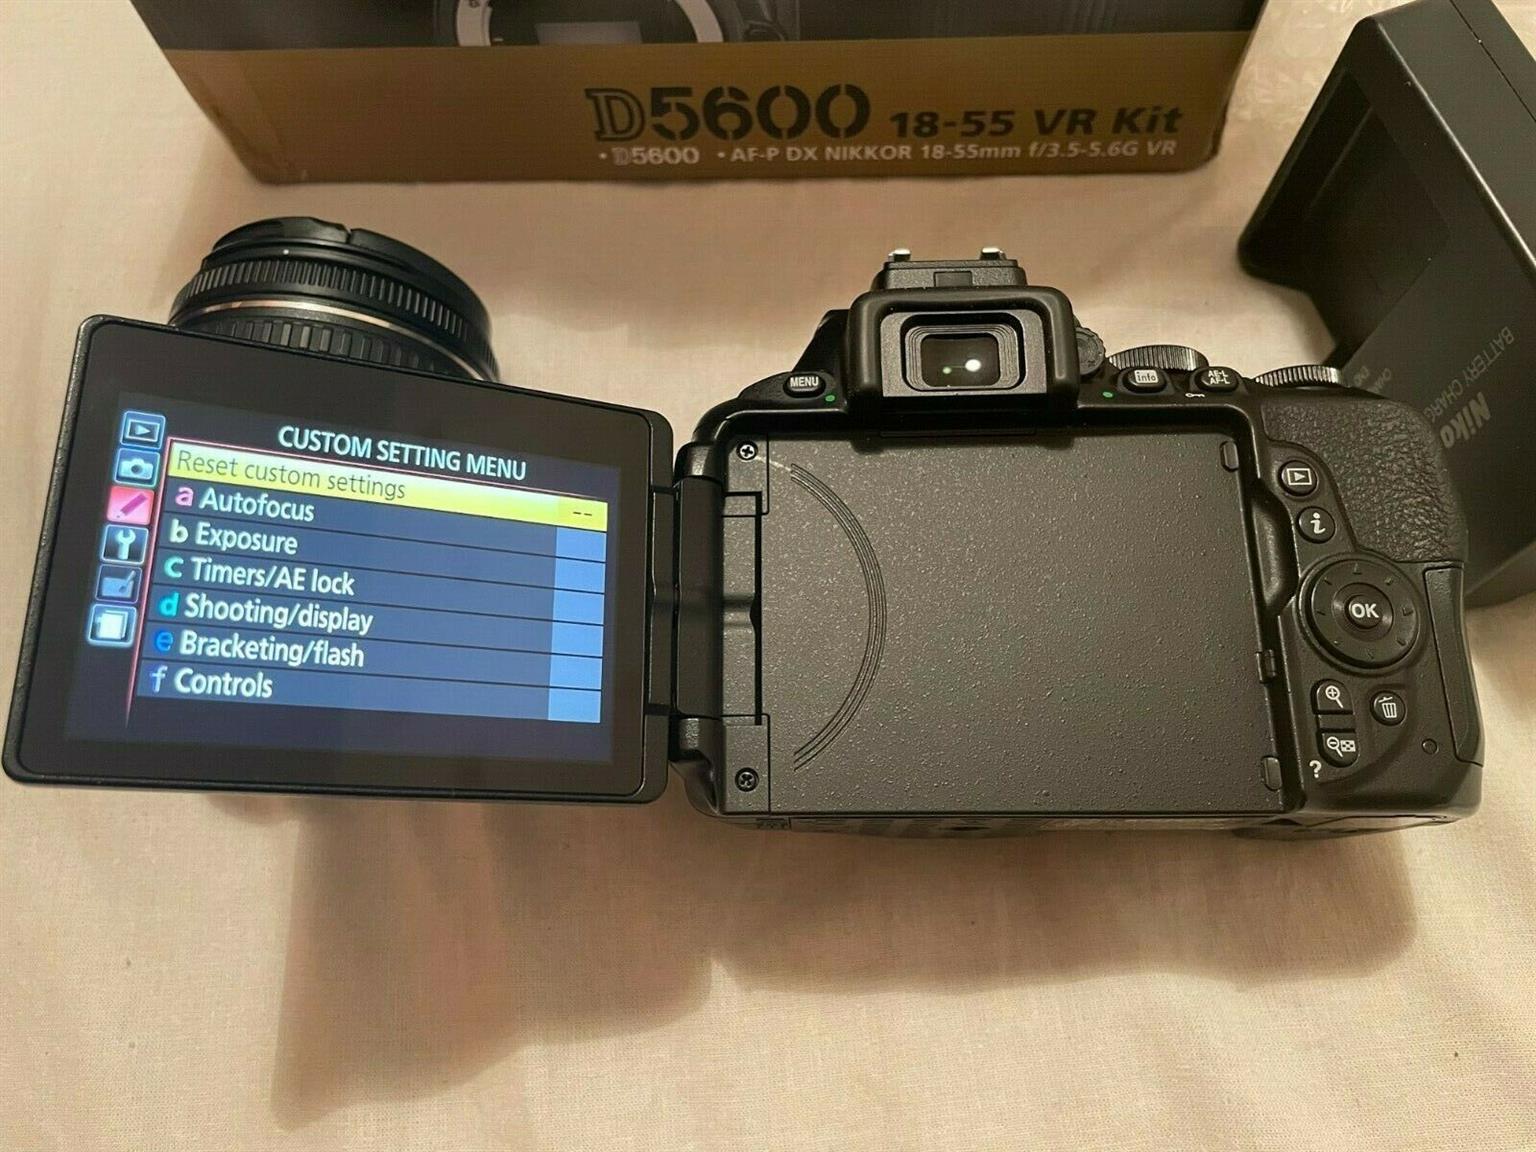 Nikon D5600 with 18-55mm Lens Kit